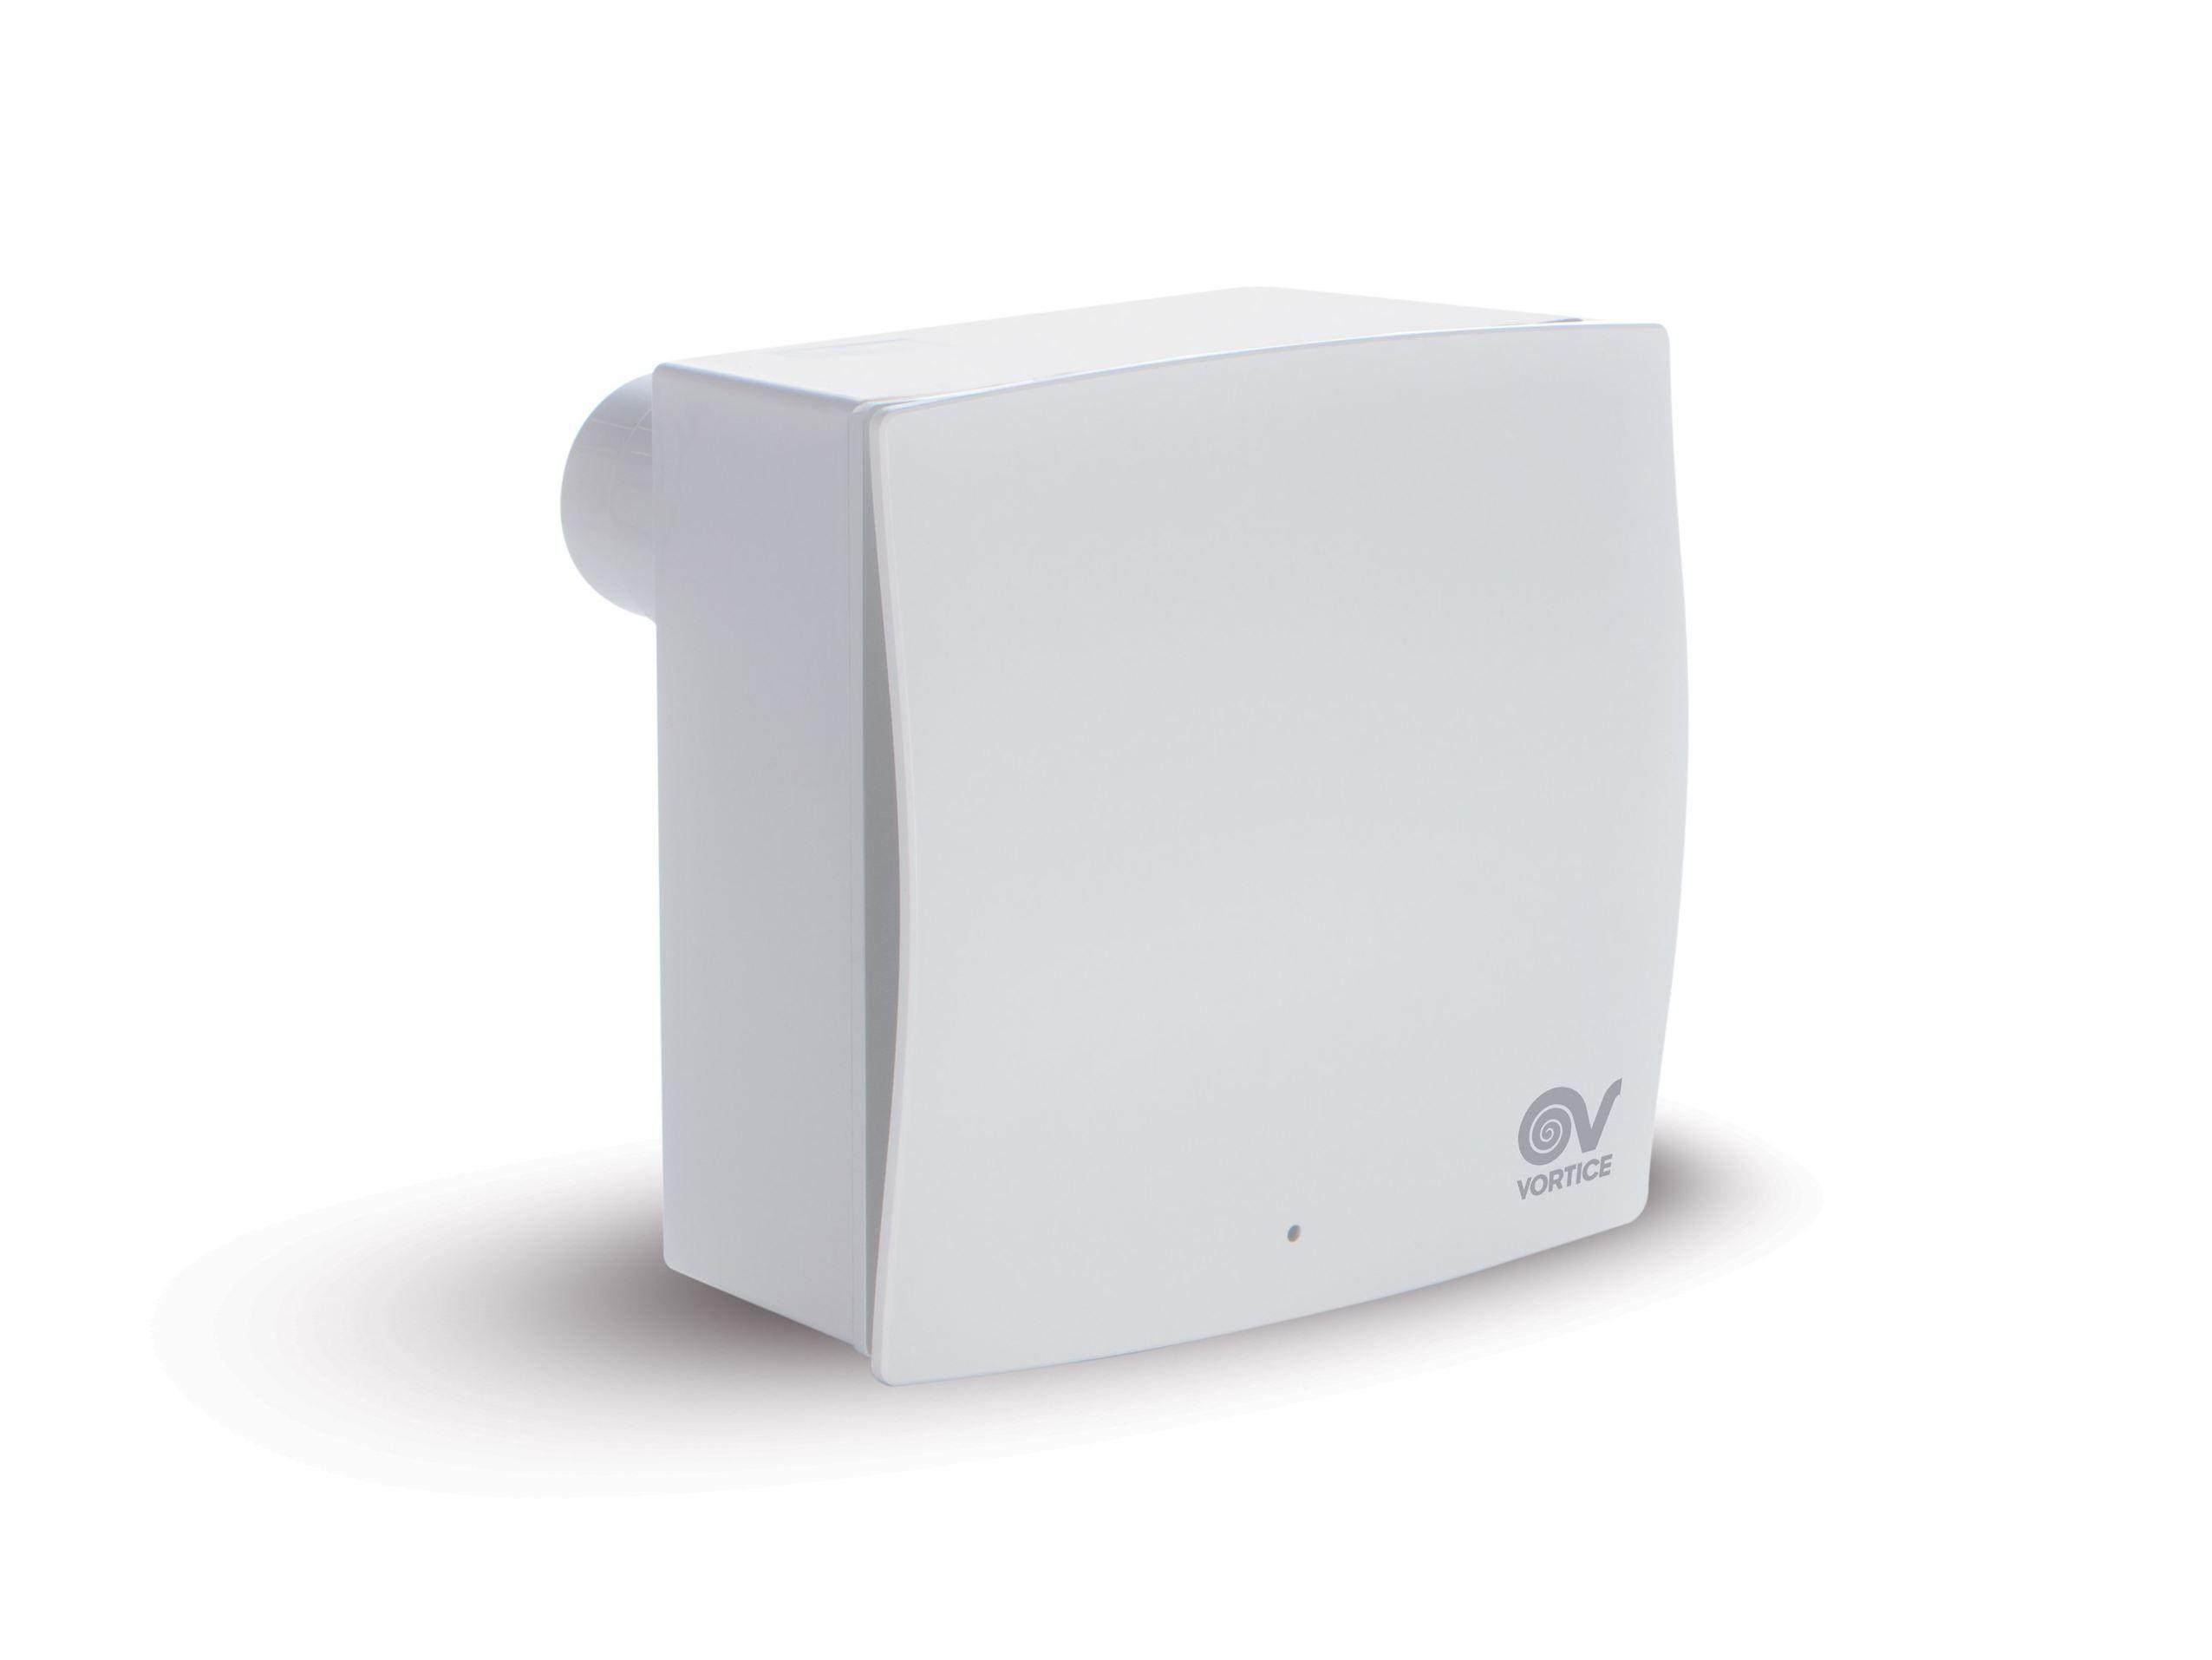 aspiratore per uso residenziale vort quadro evo by vortice - Aspiratori Da Cucina Vortice